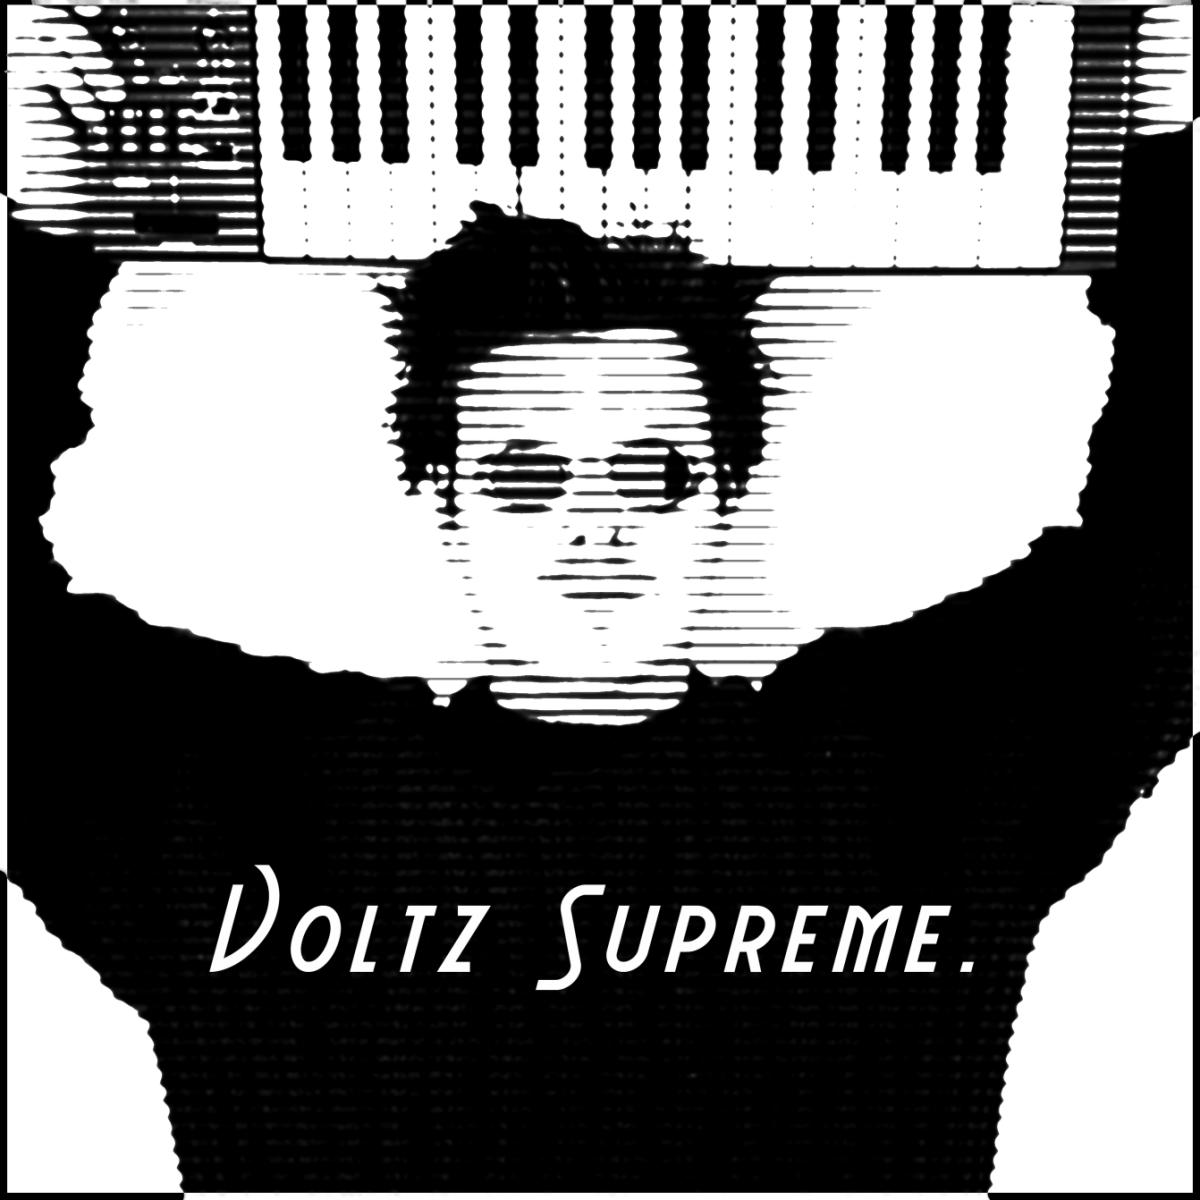 Voltz Supreme